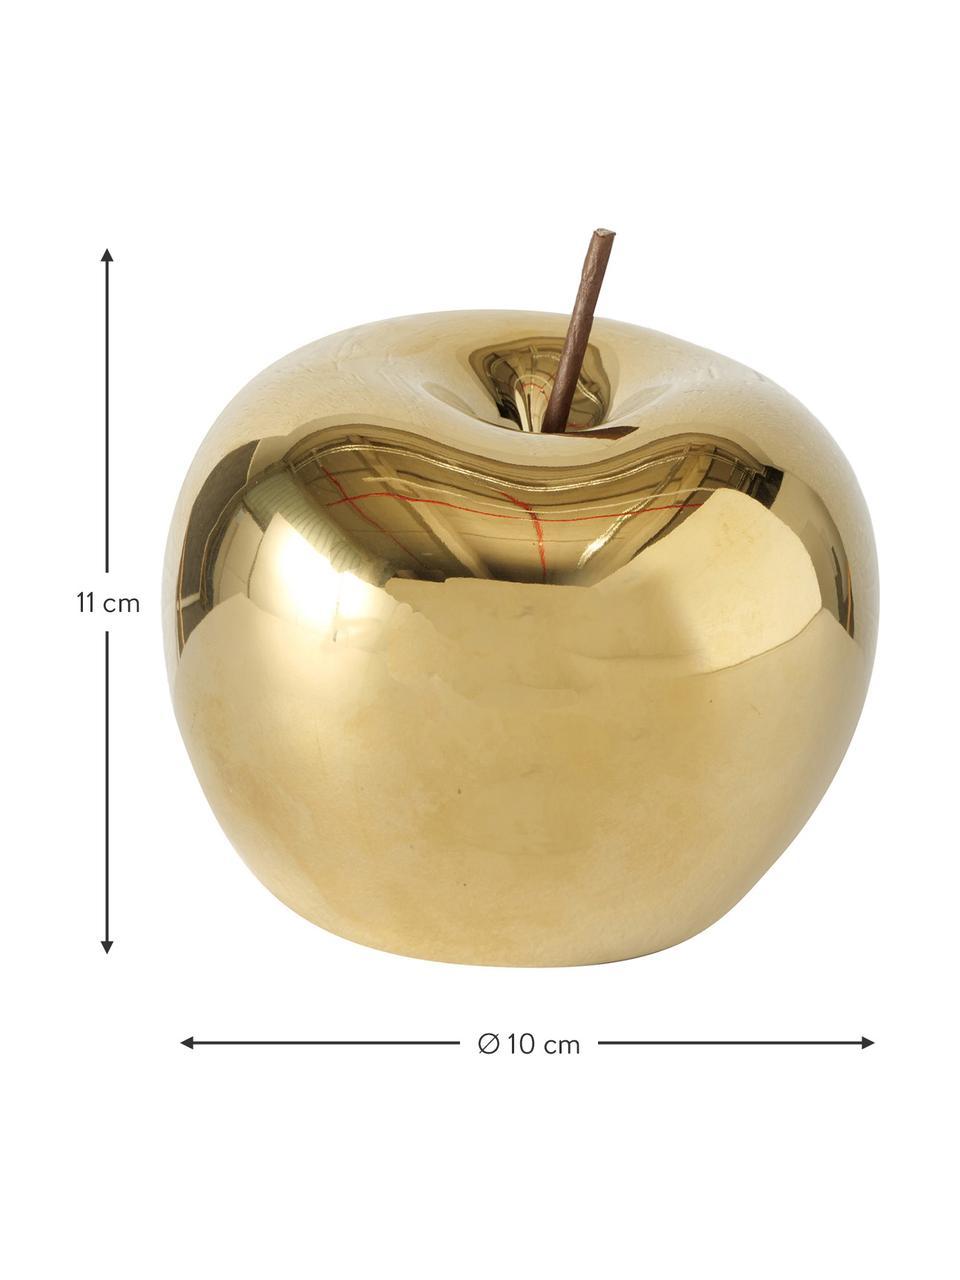 Deko-Objekt Nesta, Porzellan, Goldfarben, Ø 15 cm